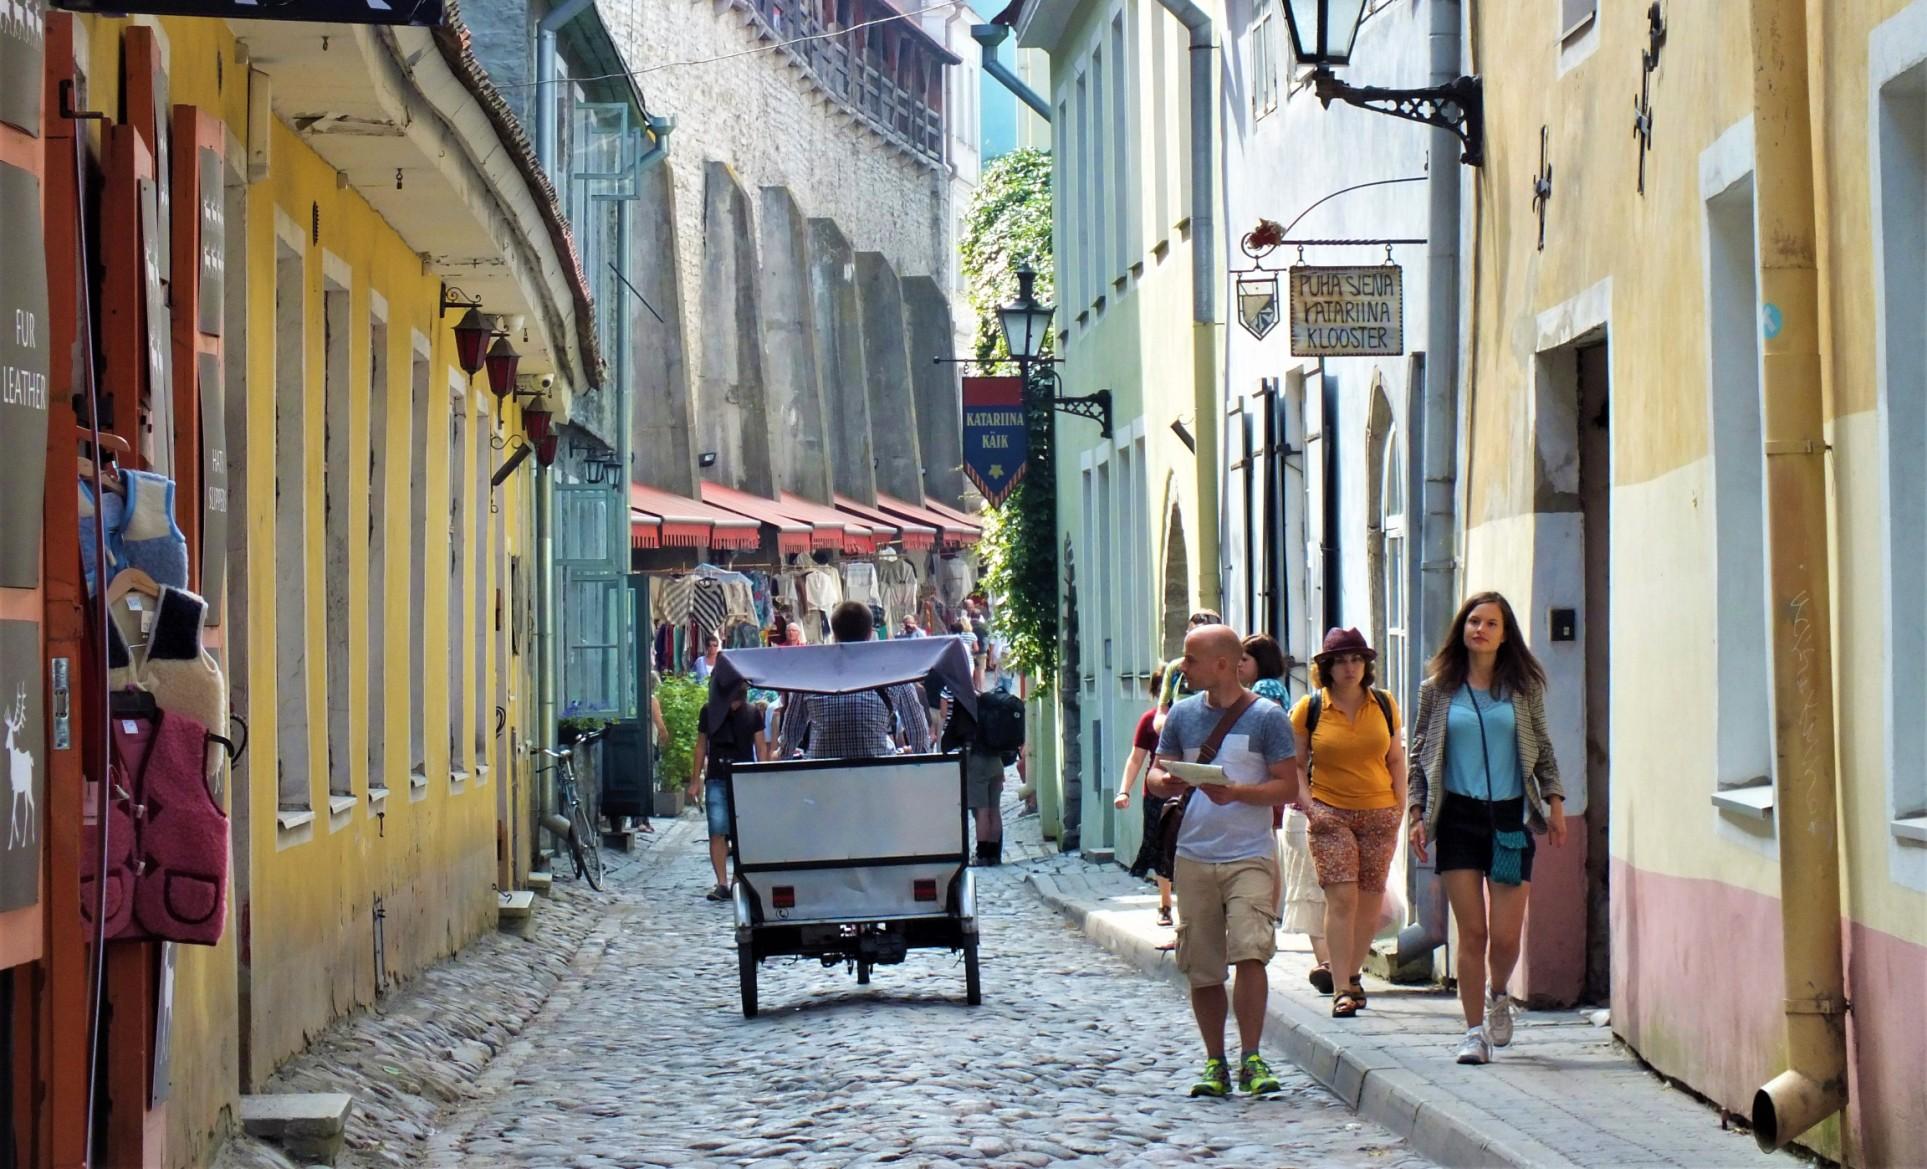 Tours in Tallinn Estonia